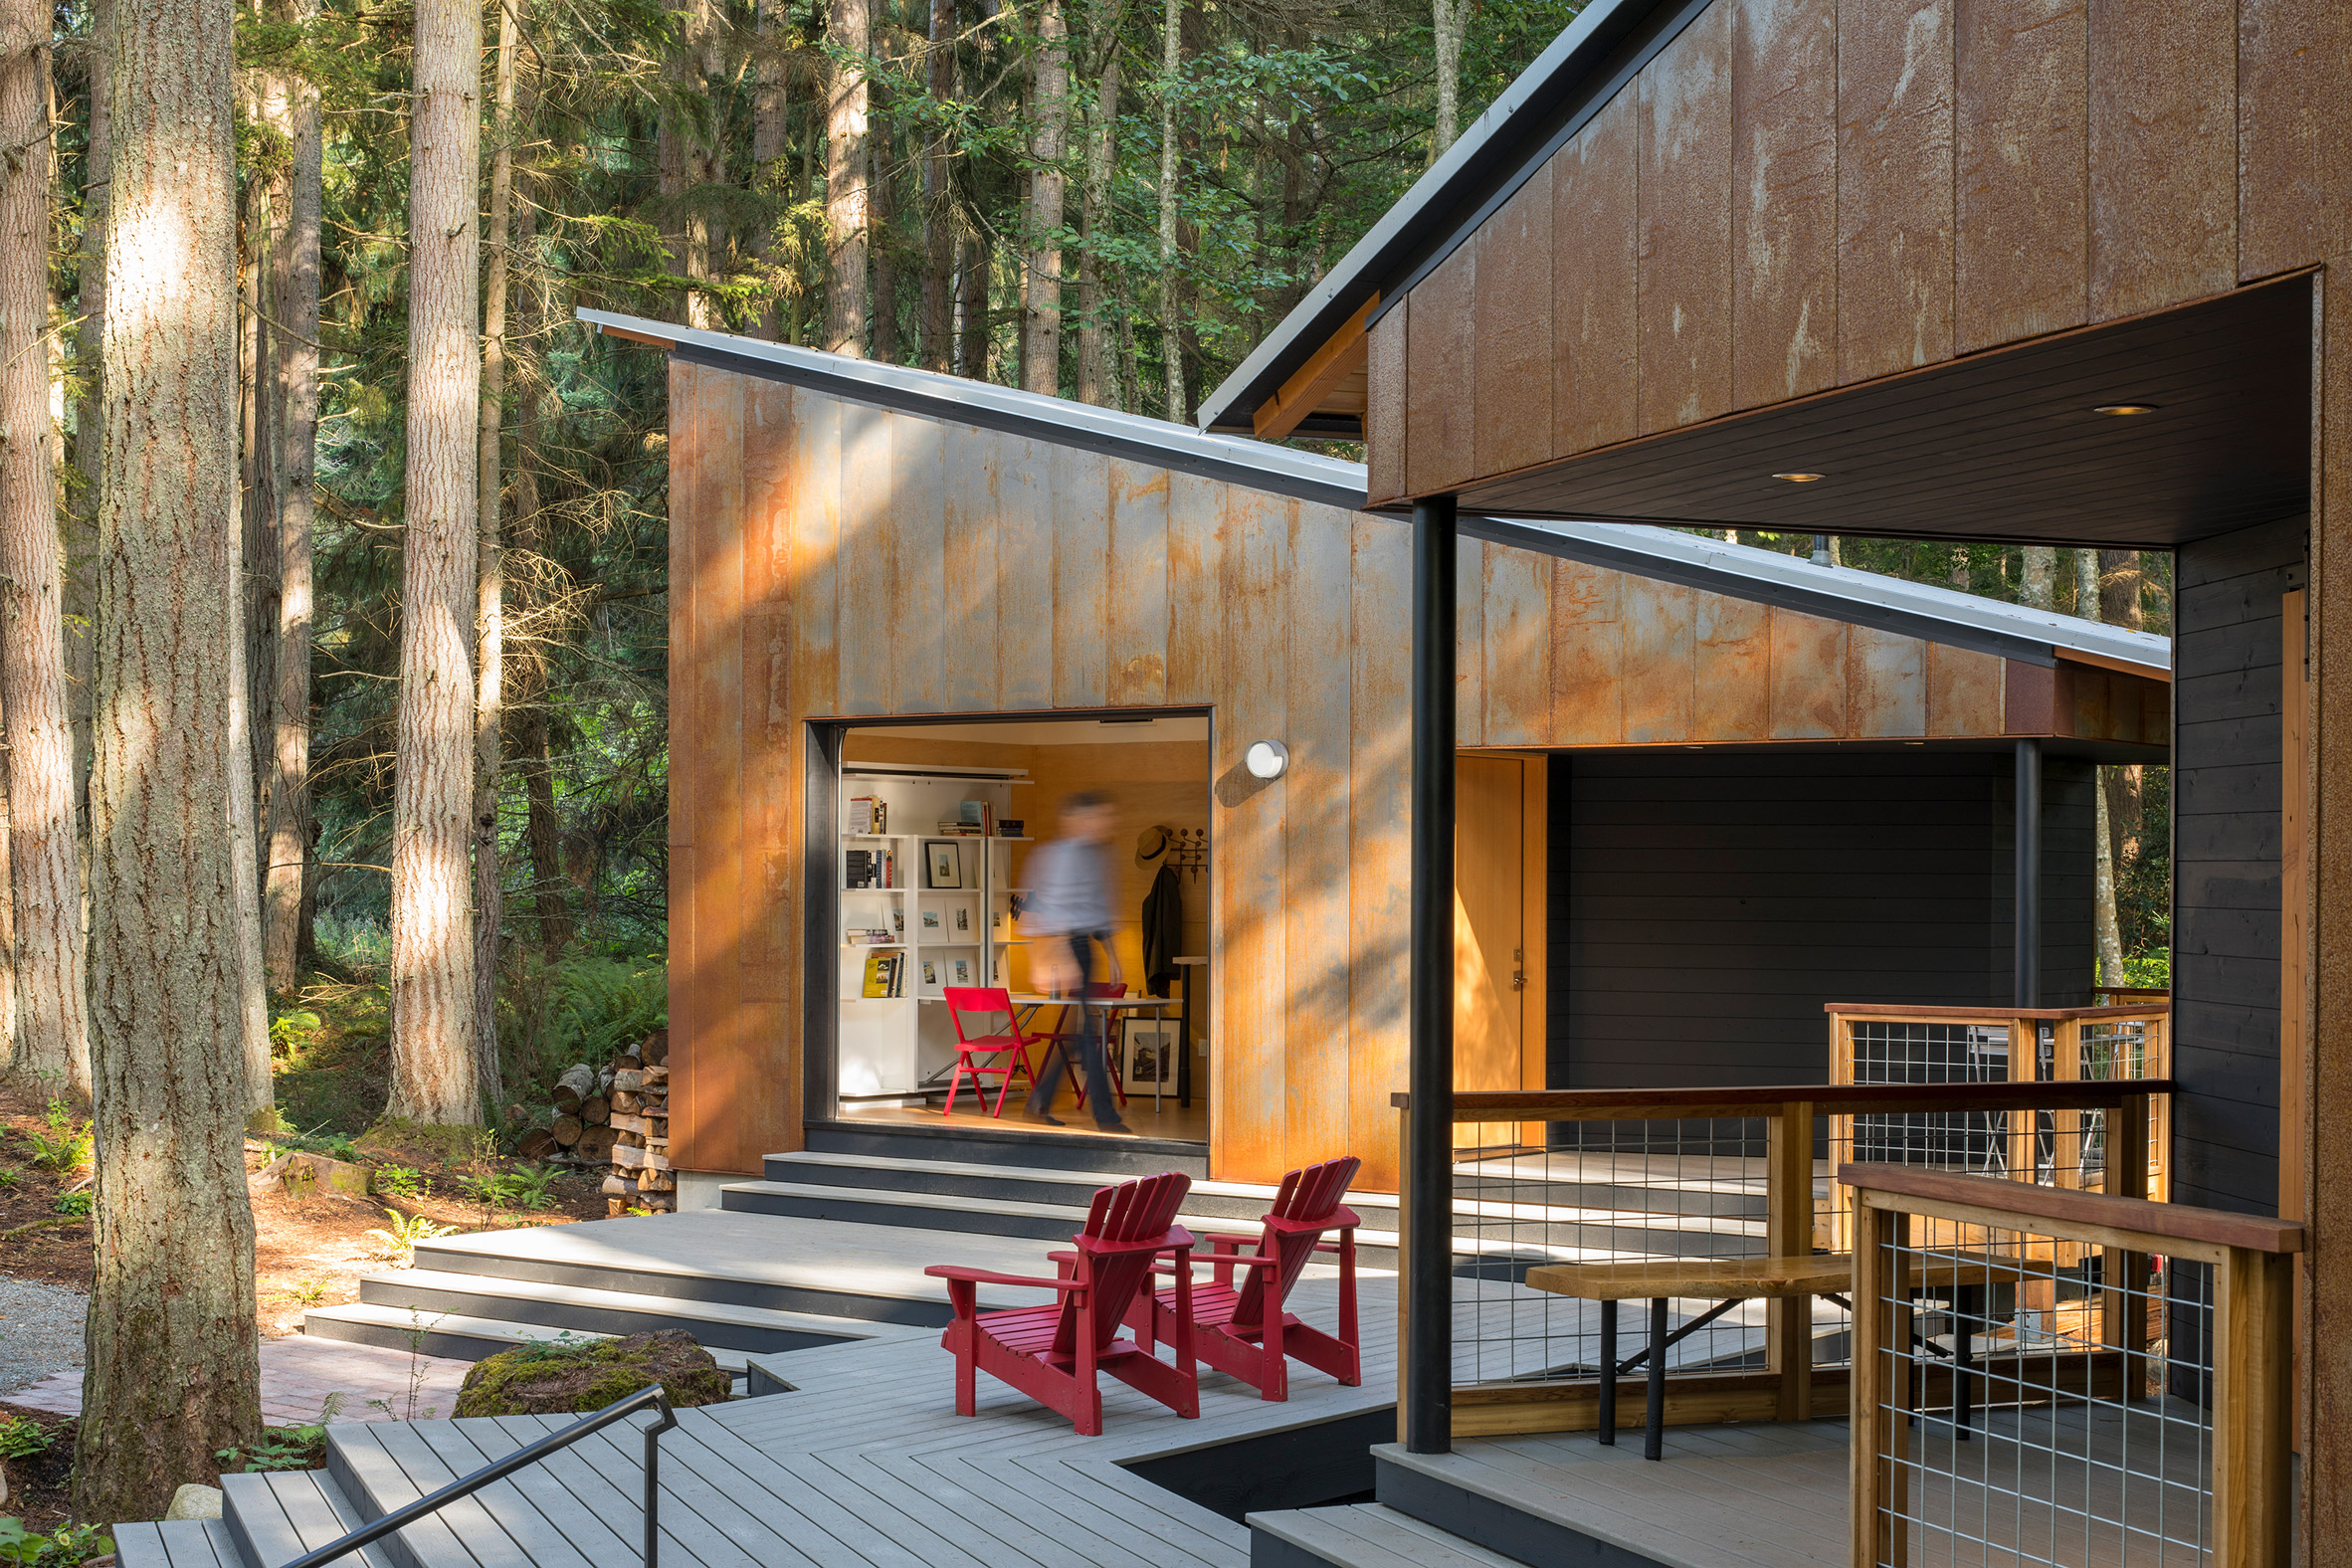 Corten steel clads Little House/Big Shed in Washington by David Van Galen